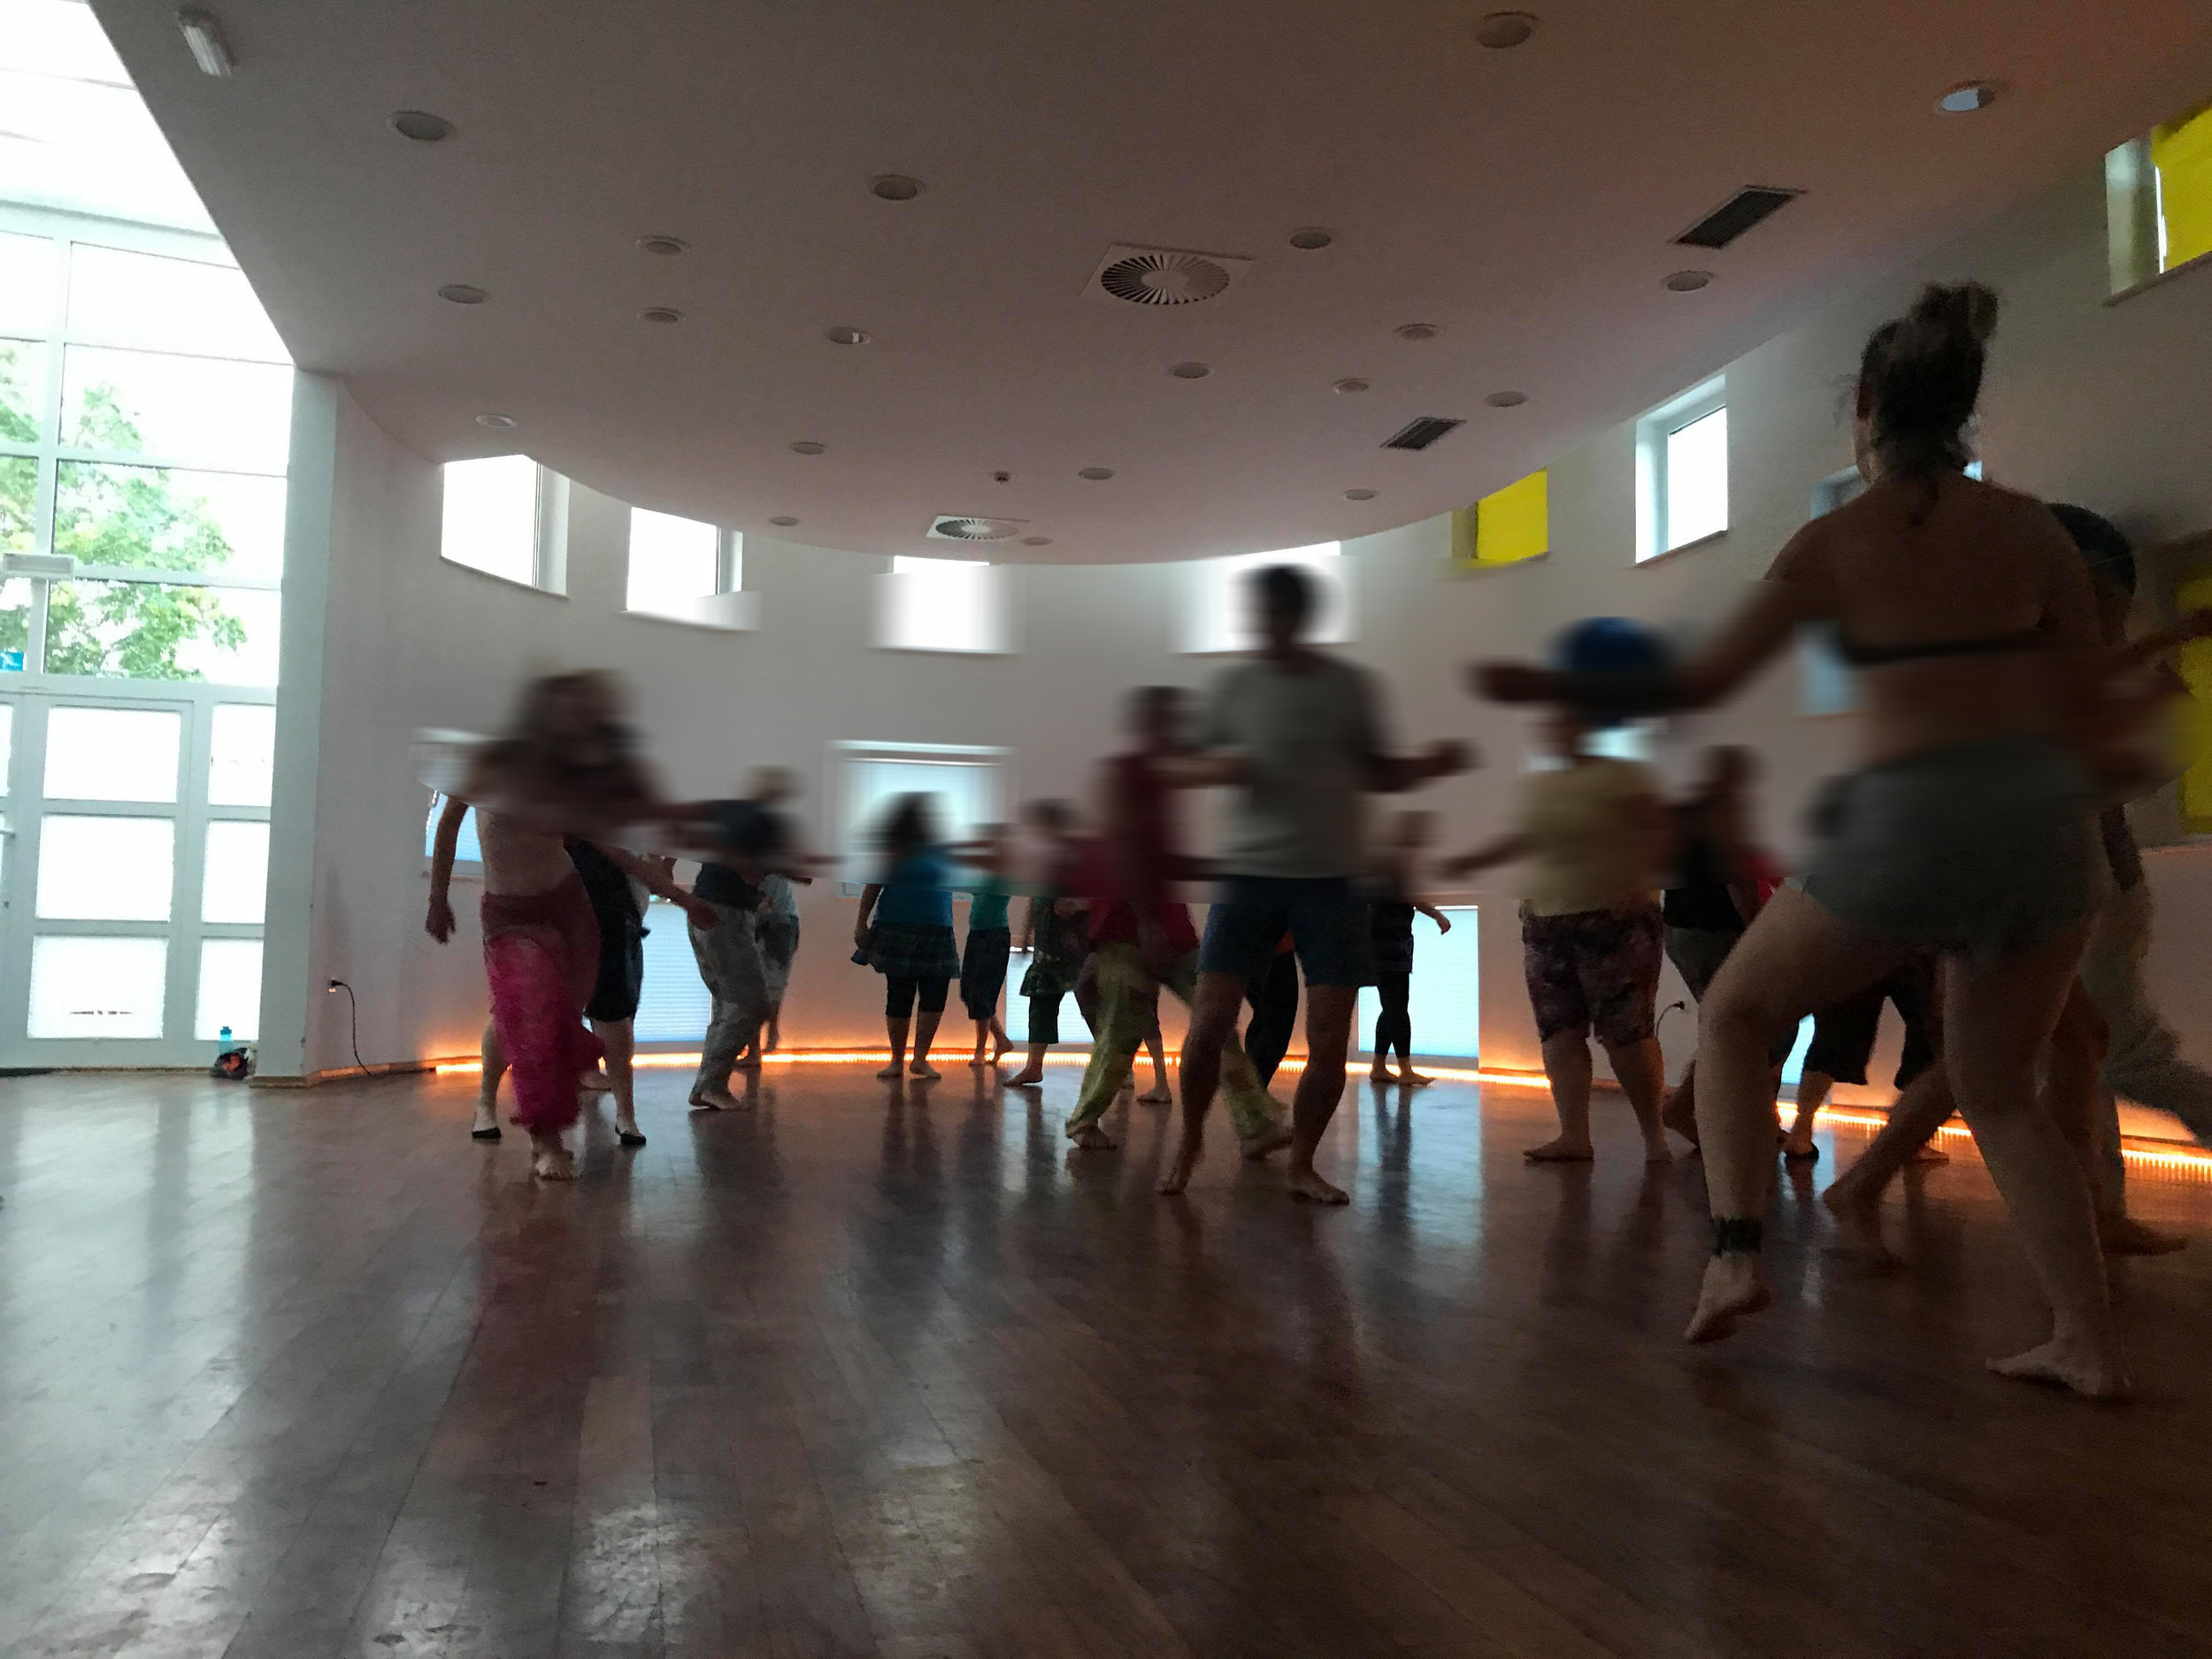 soul flight promo dance space 2 blur.jpg